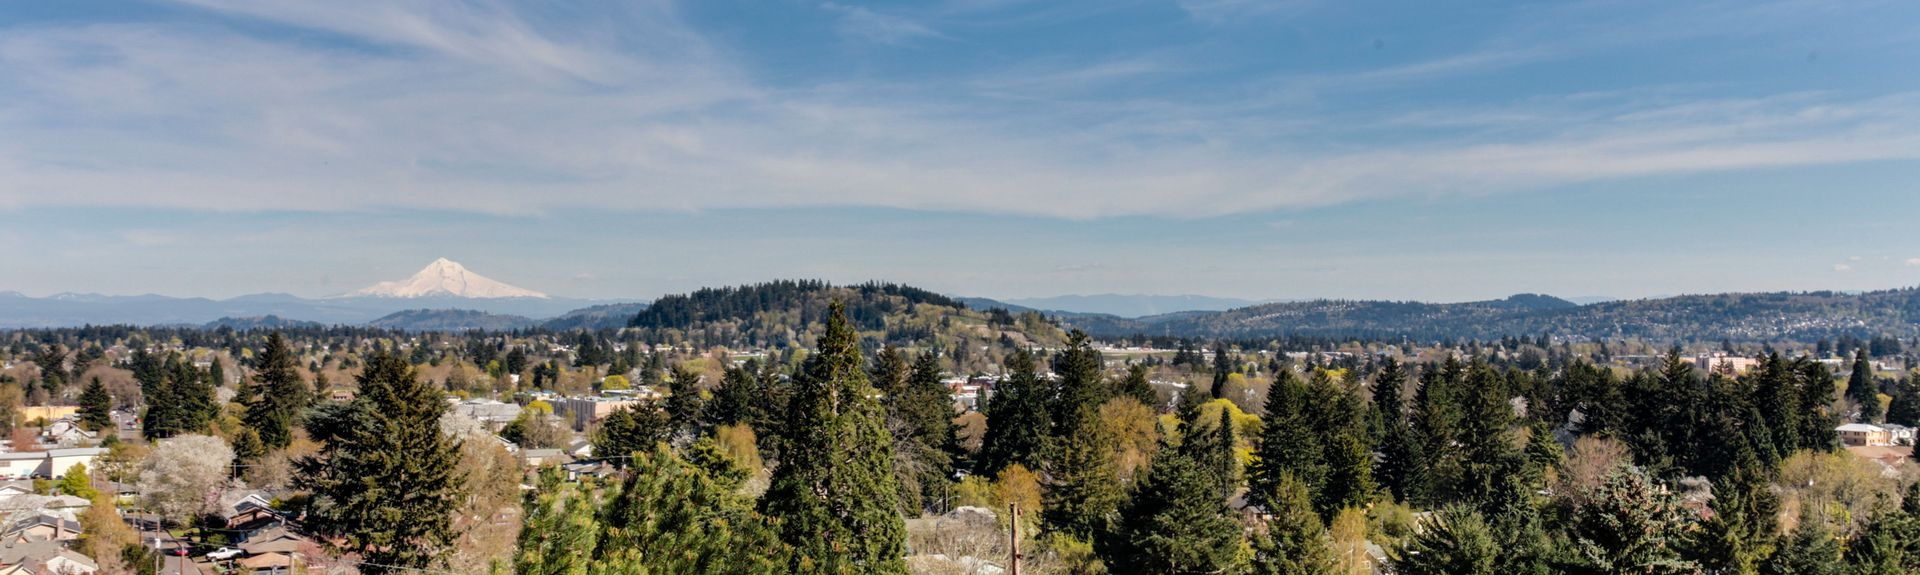 Montavilla, Portland, OR, USA